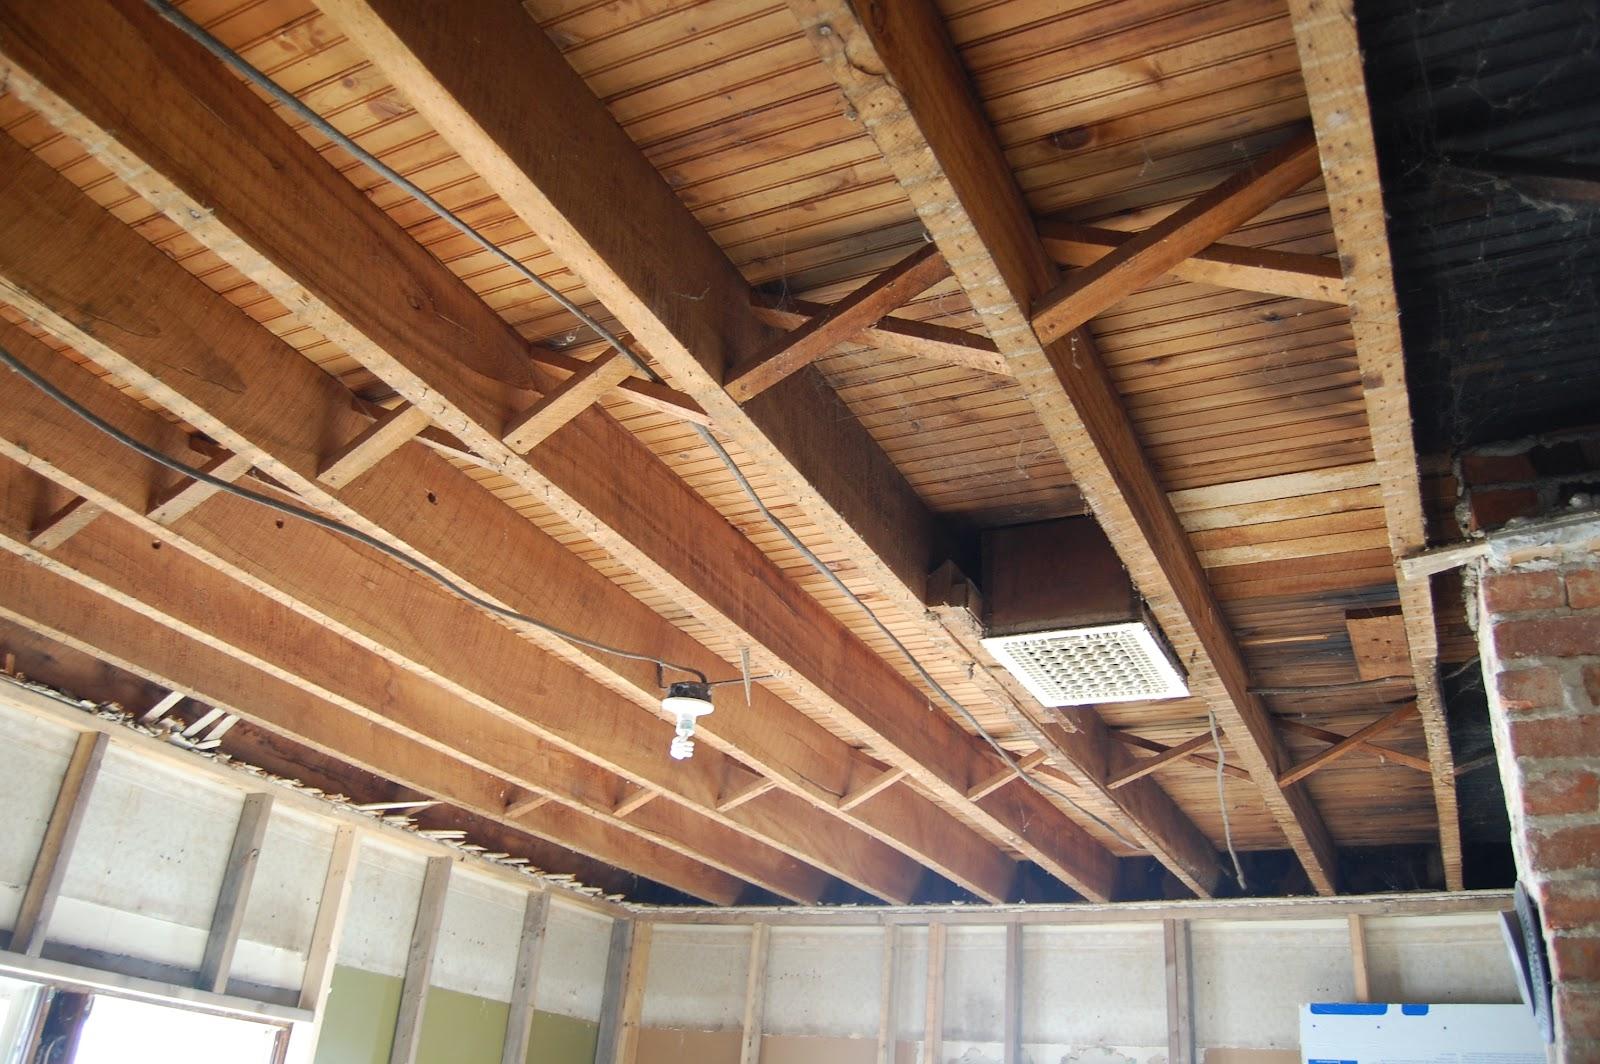 Soundproofing Basement Ceiling Joists